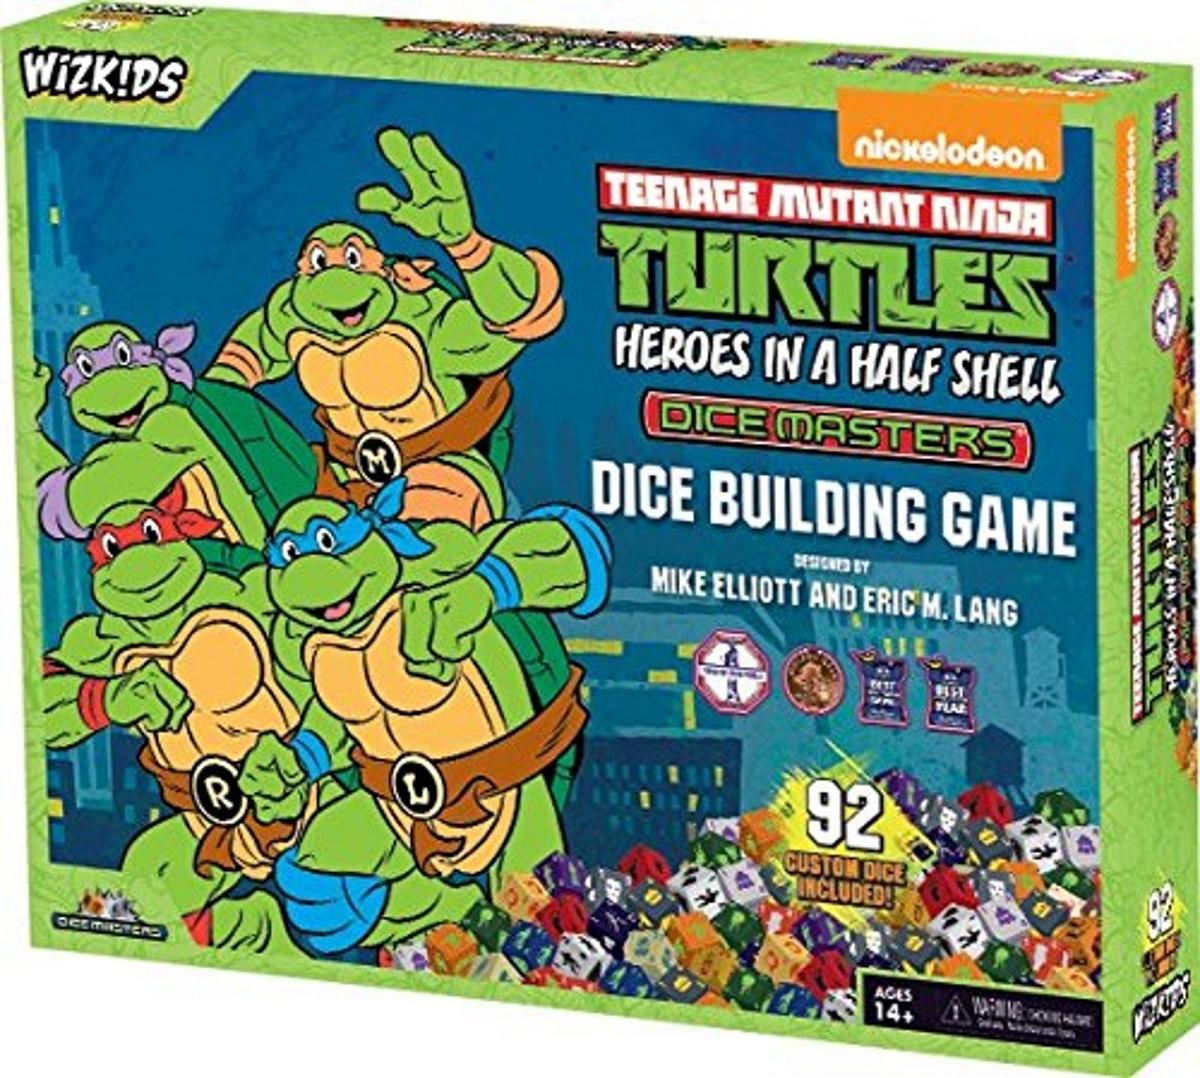 Teenage mutant ninja turtles dice masters heroes in a half shell box set